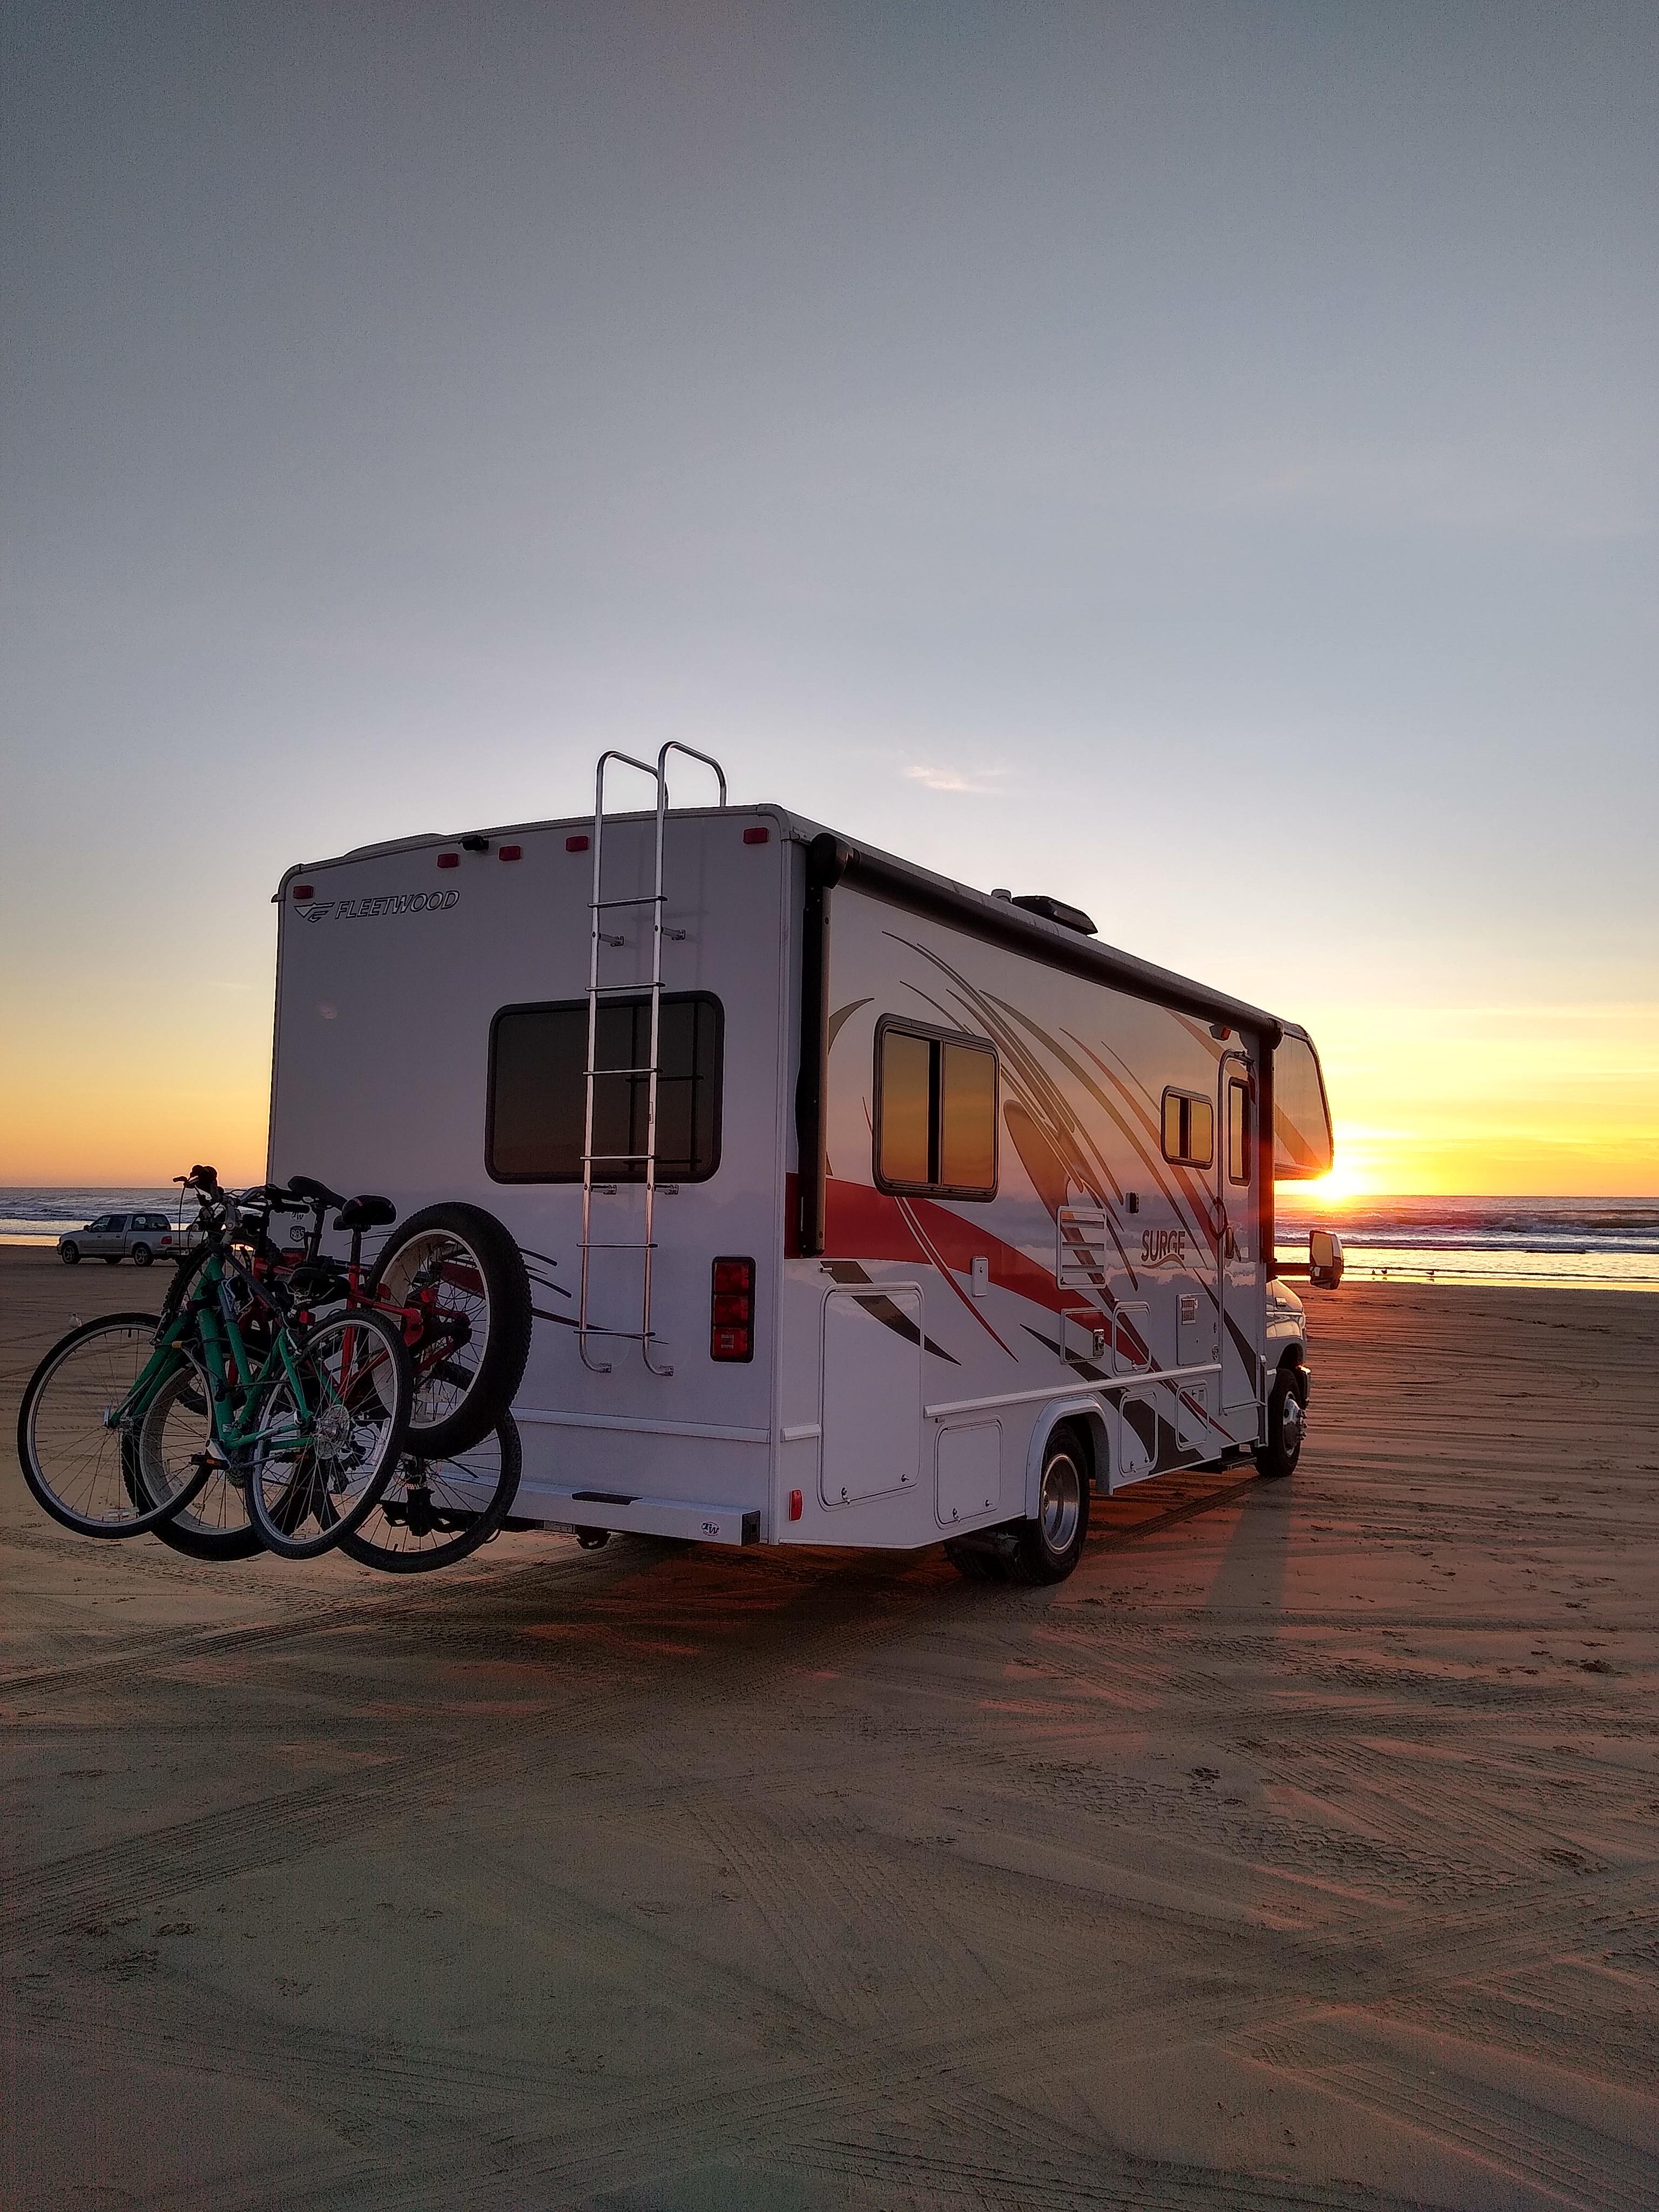 Enjoy a beautiful sunset at the beach . Fleetwood Surge 2018